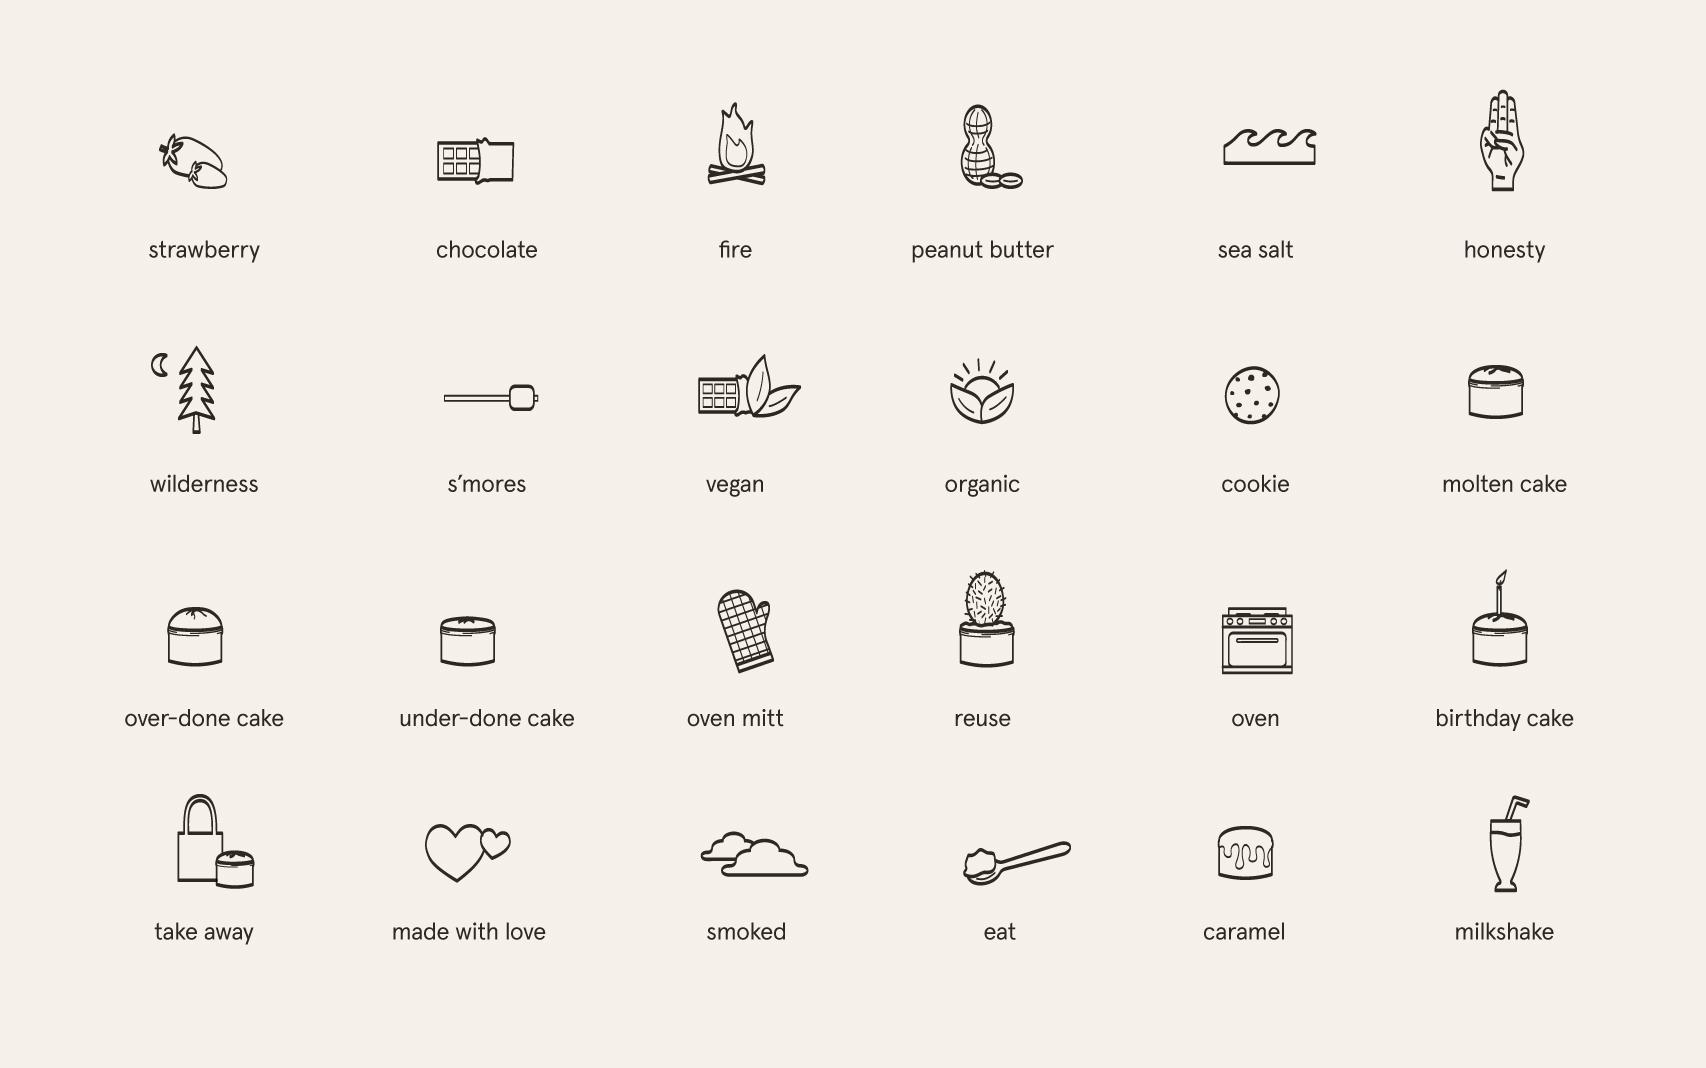 Hotcakes_CaseStudy_IconSet